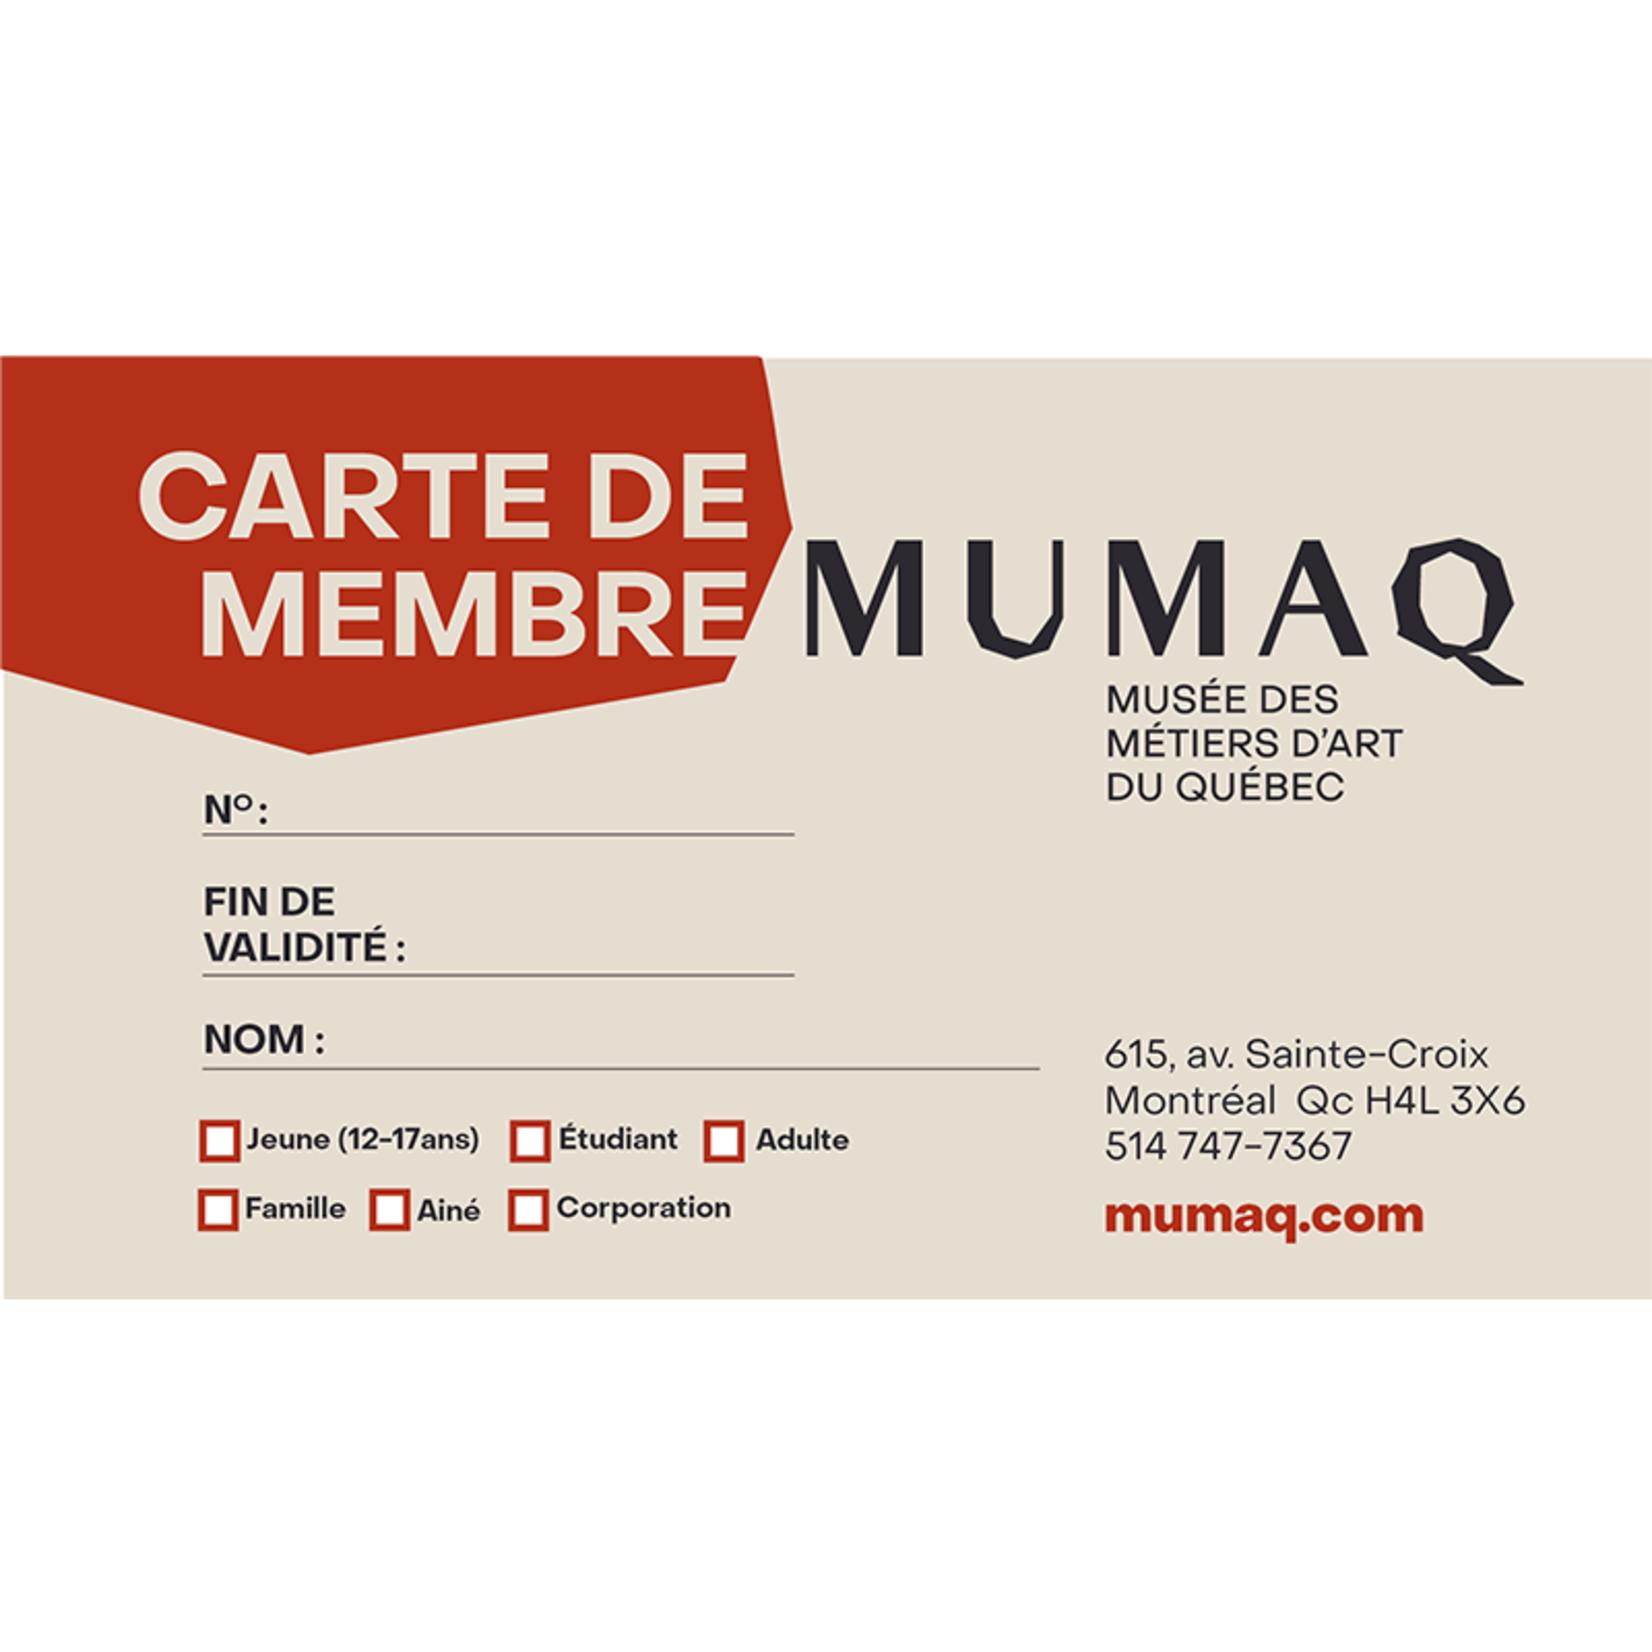 2 years membership card - Youth (12 to 17)